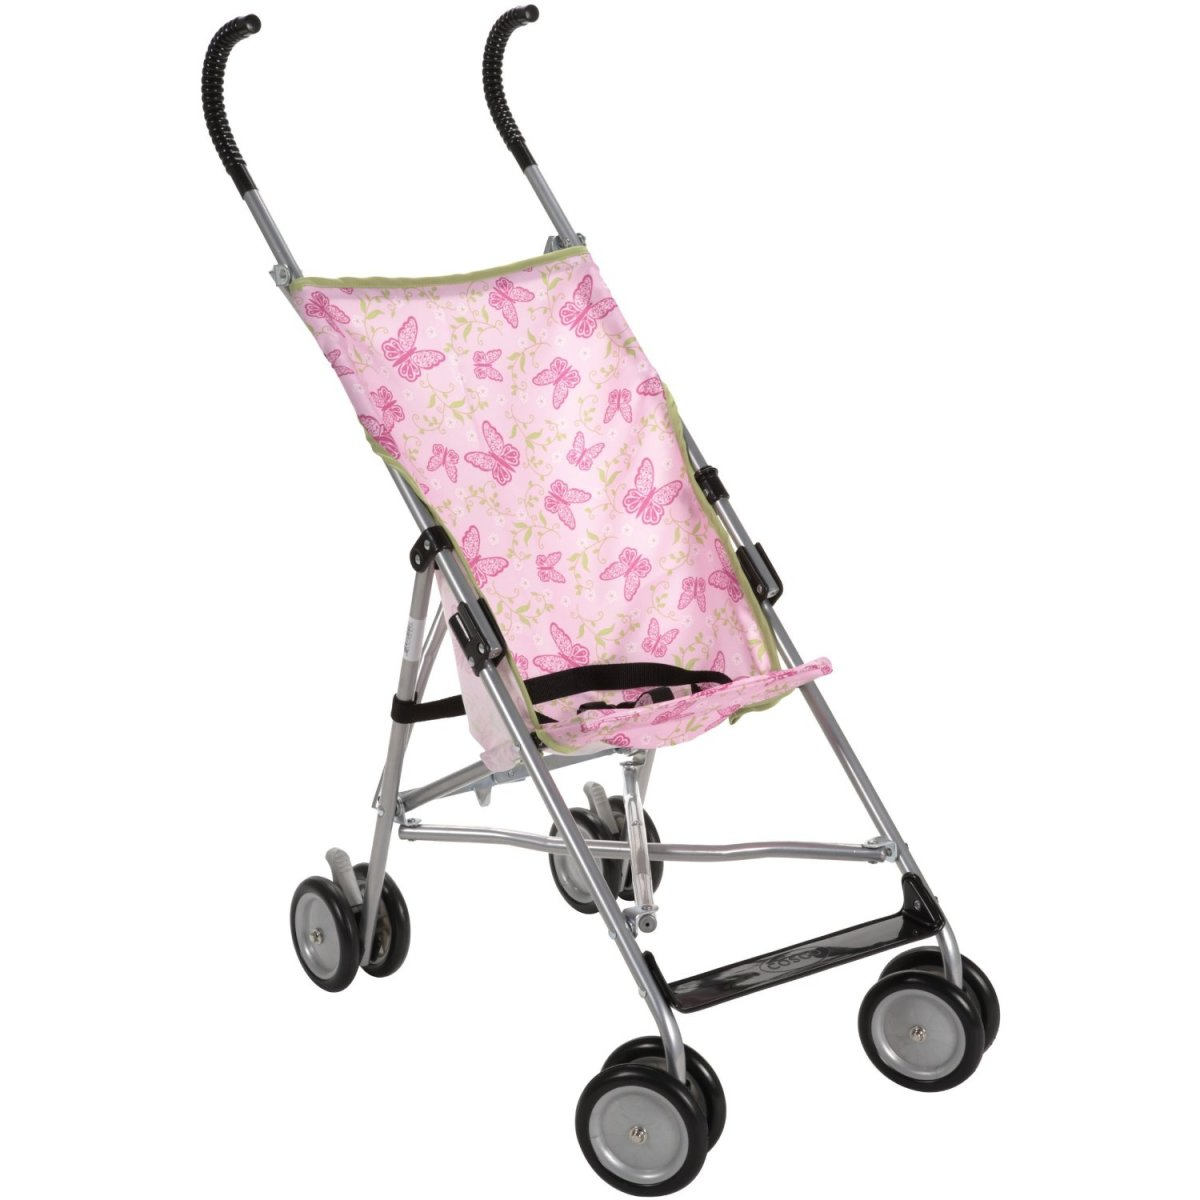 Best Brand Of Travel Strollers